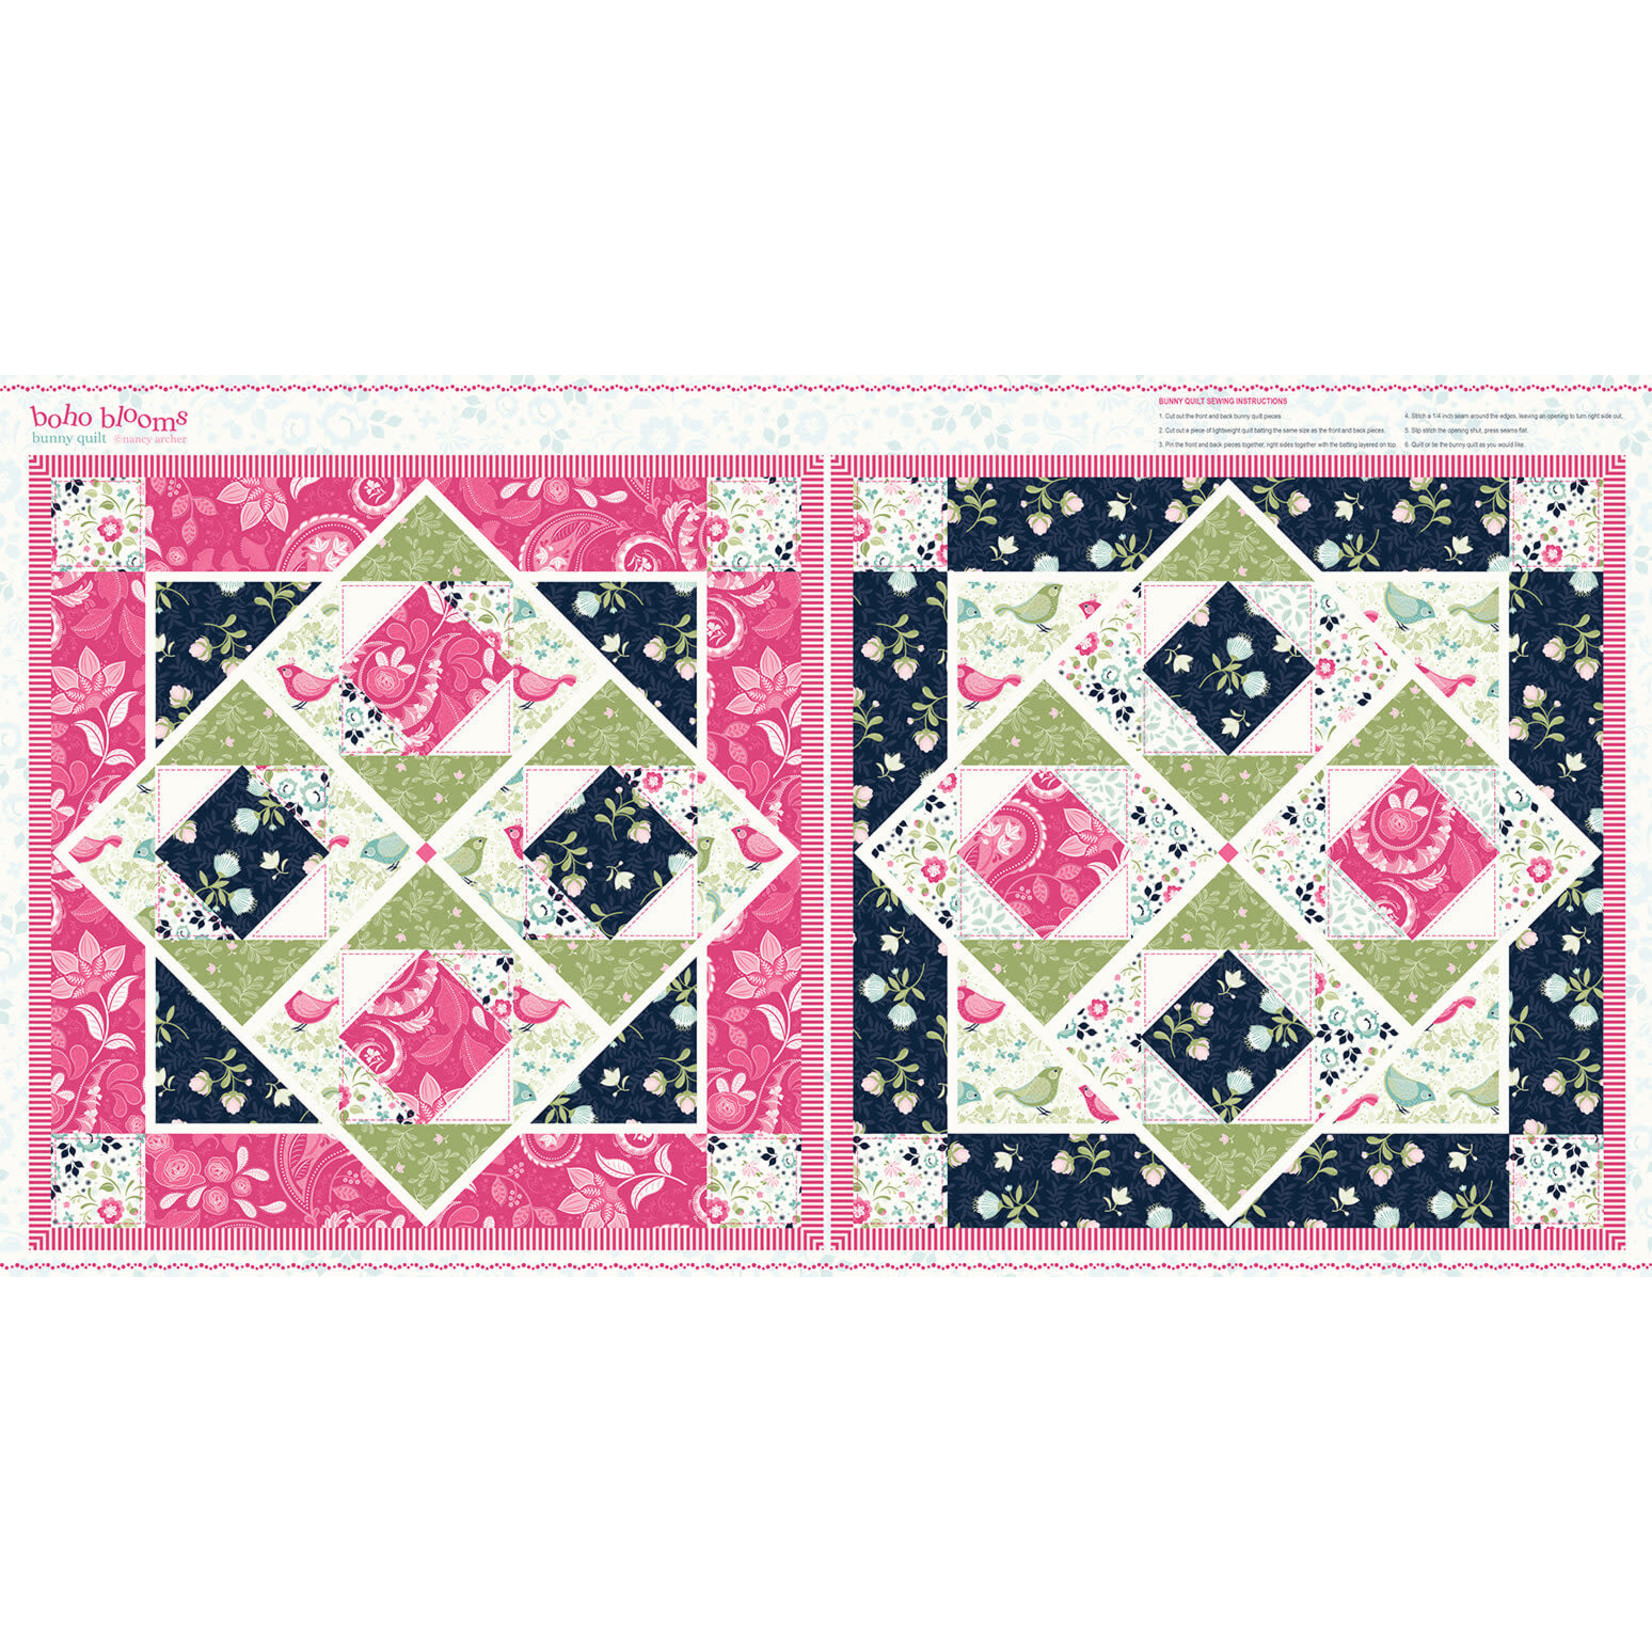 STUDIO E 50cm Square Panel - Boho Blooms, Bunny Cheater Quilt